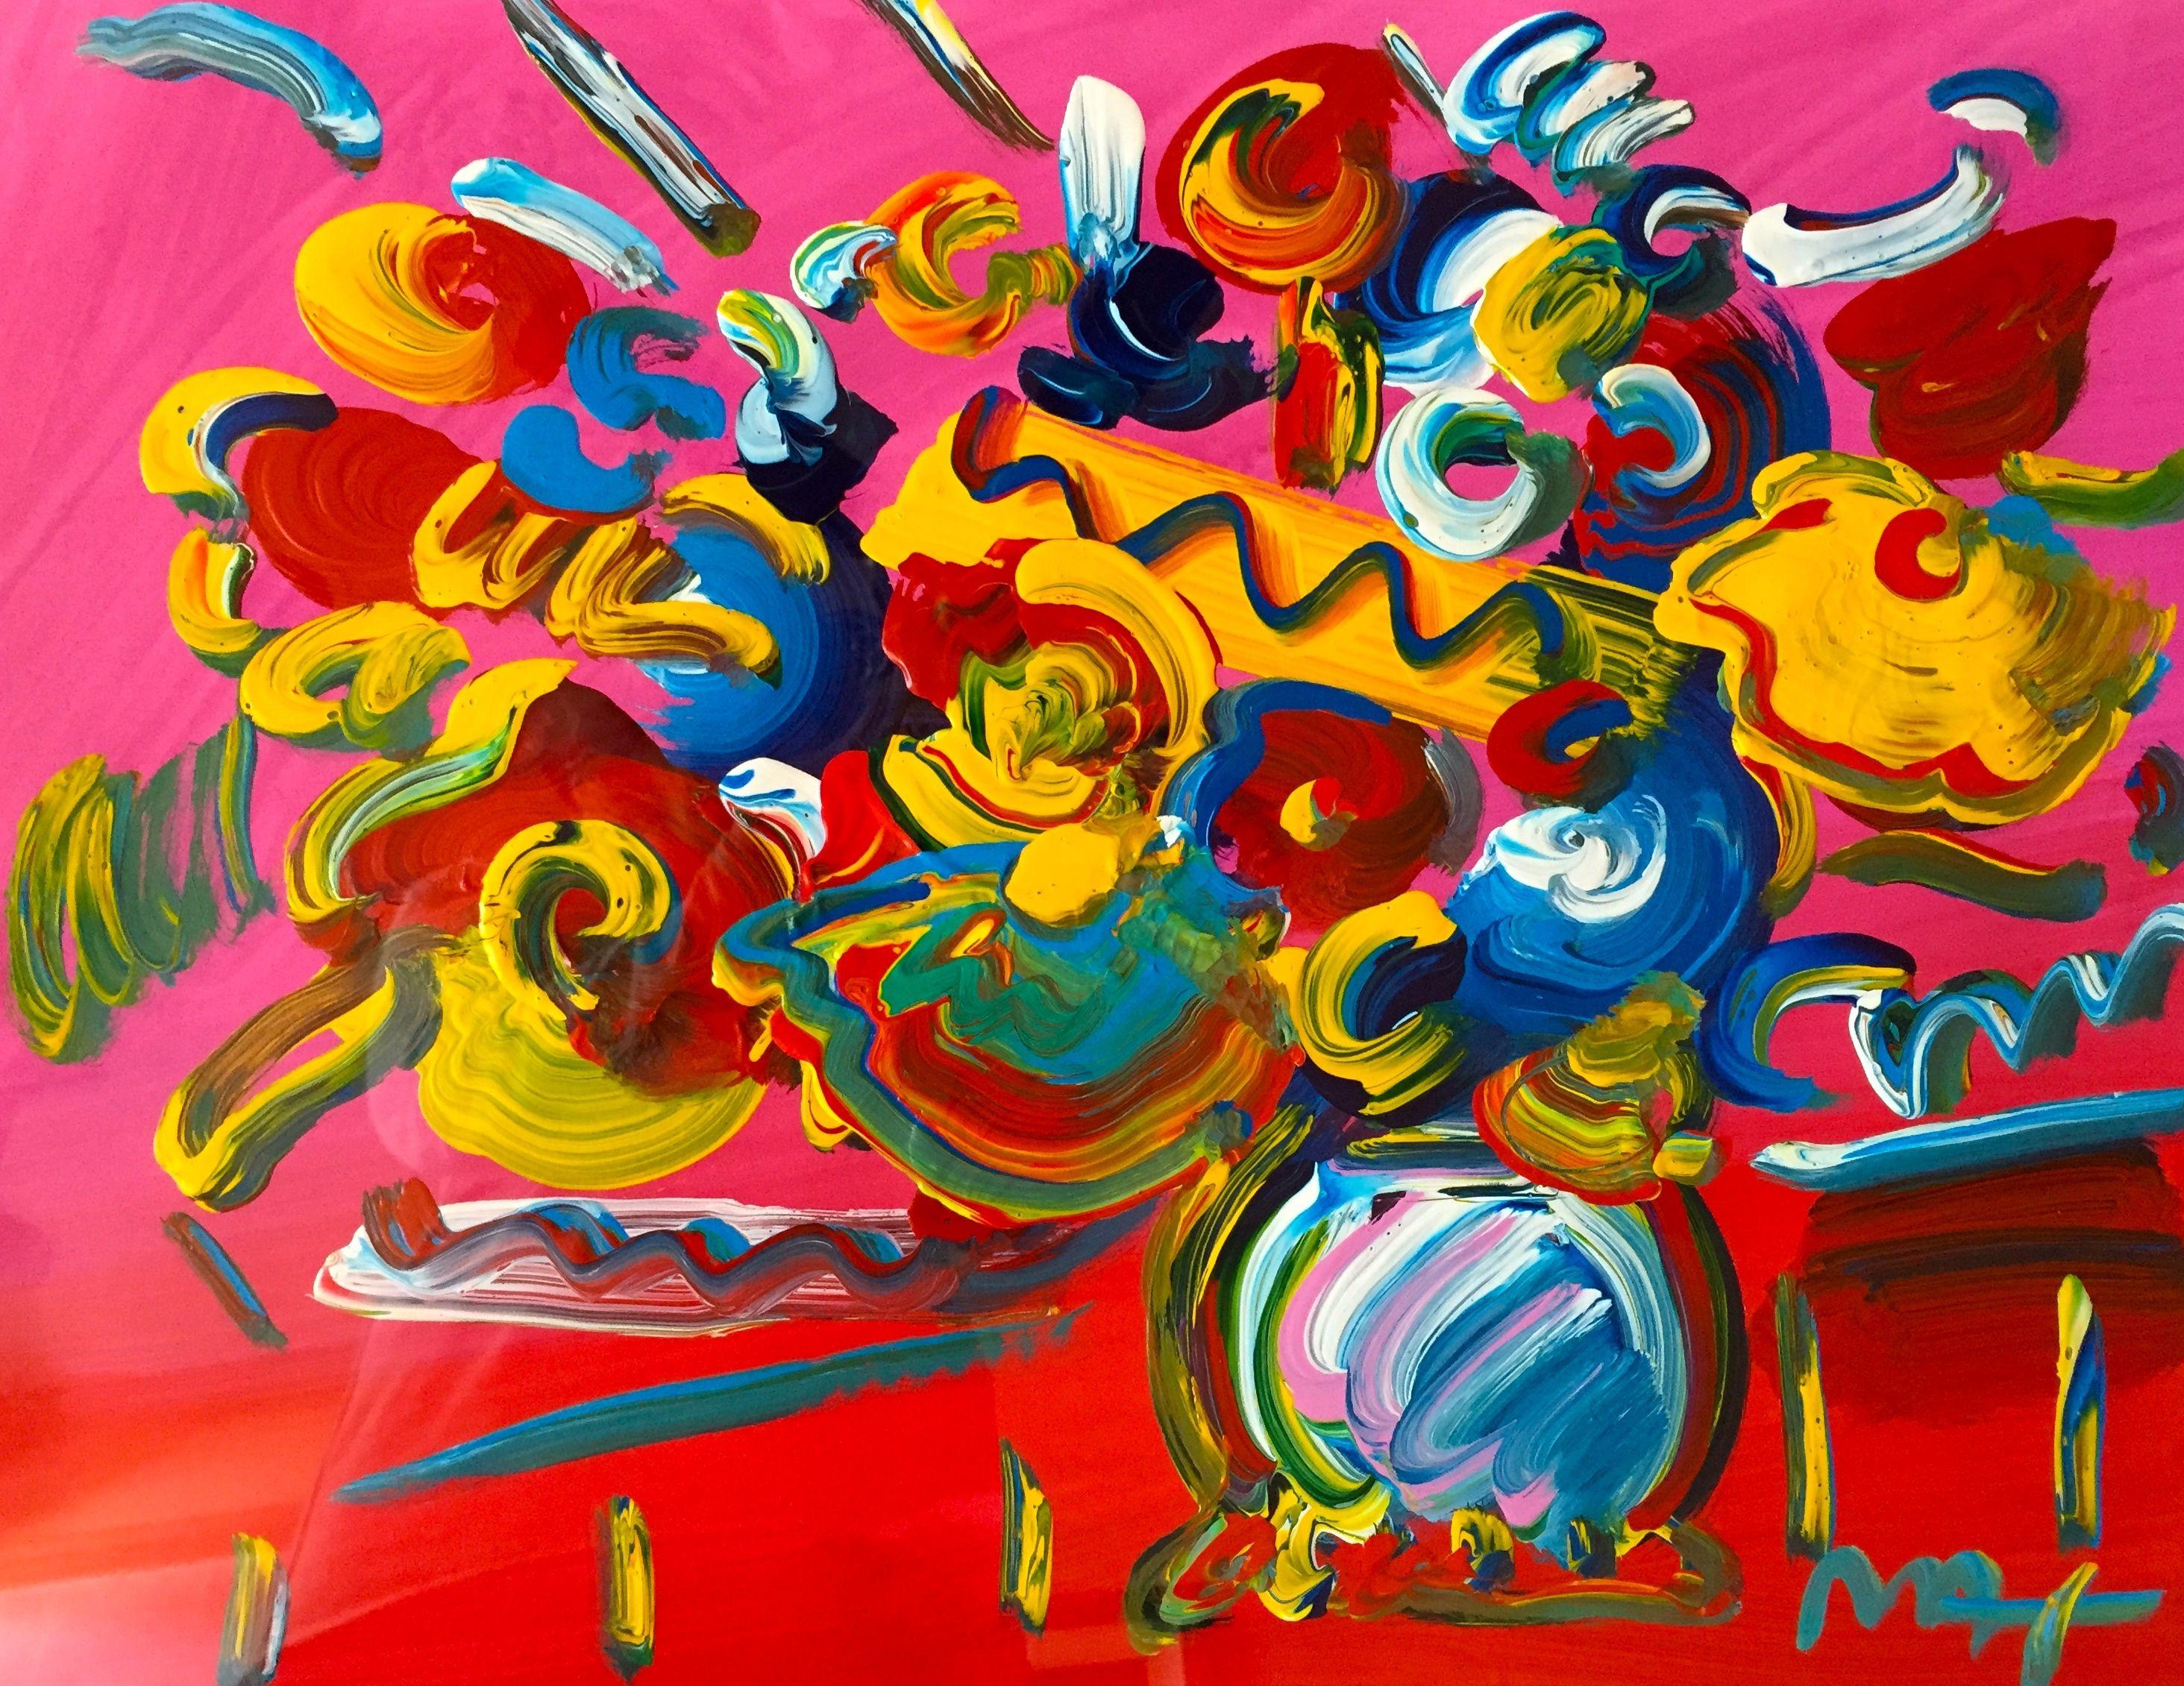 peter max art for sale art pinterest peter max art and art flowers. Black Bedroom Furniture Sets. Home Design Ideas